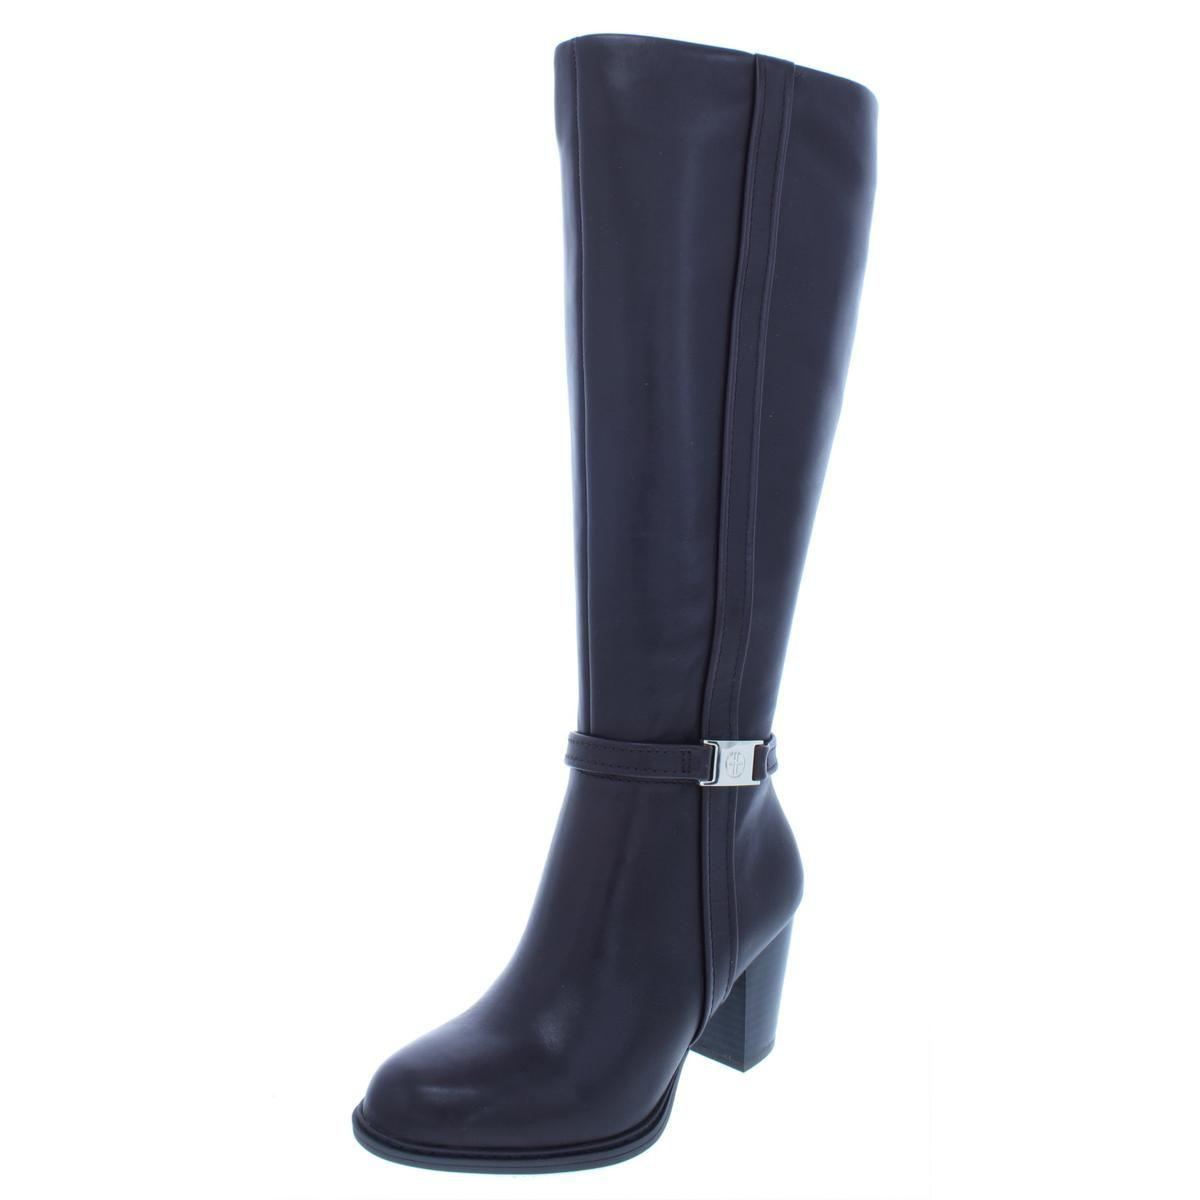 6eaa5bfa85bd Lyst - Giani Bernini Womens Raiven 2 Leather Wide Calf Over-the-knee ...